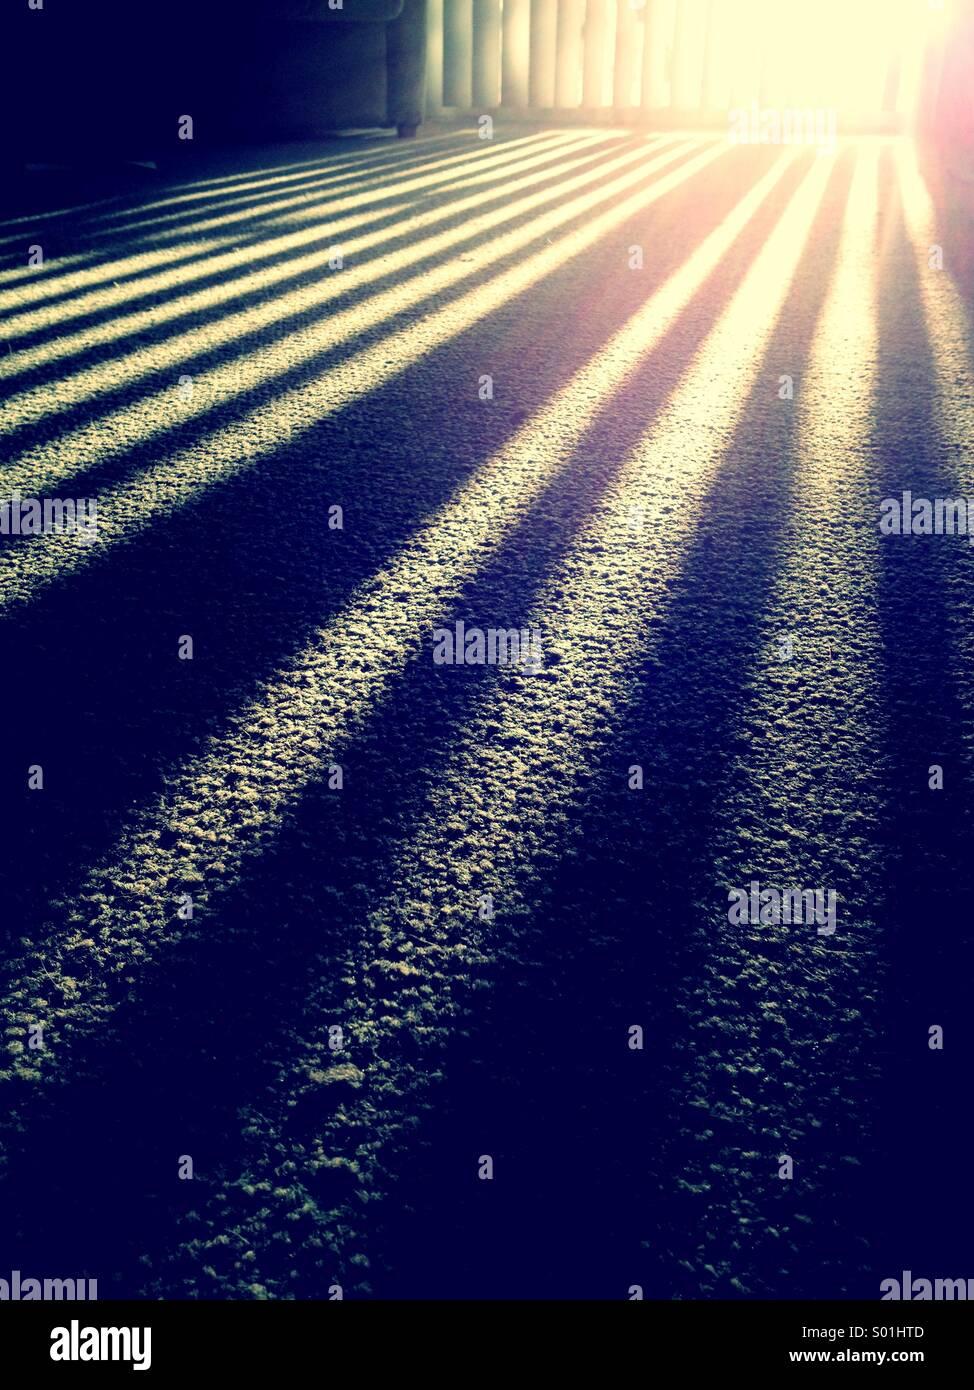 Sunlight Through Blinds - Stock Image